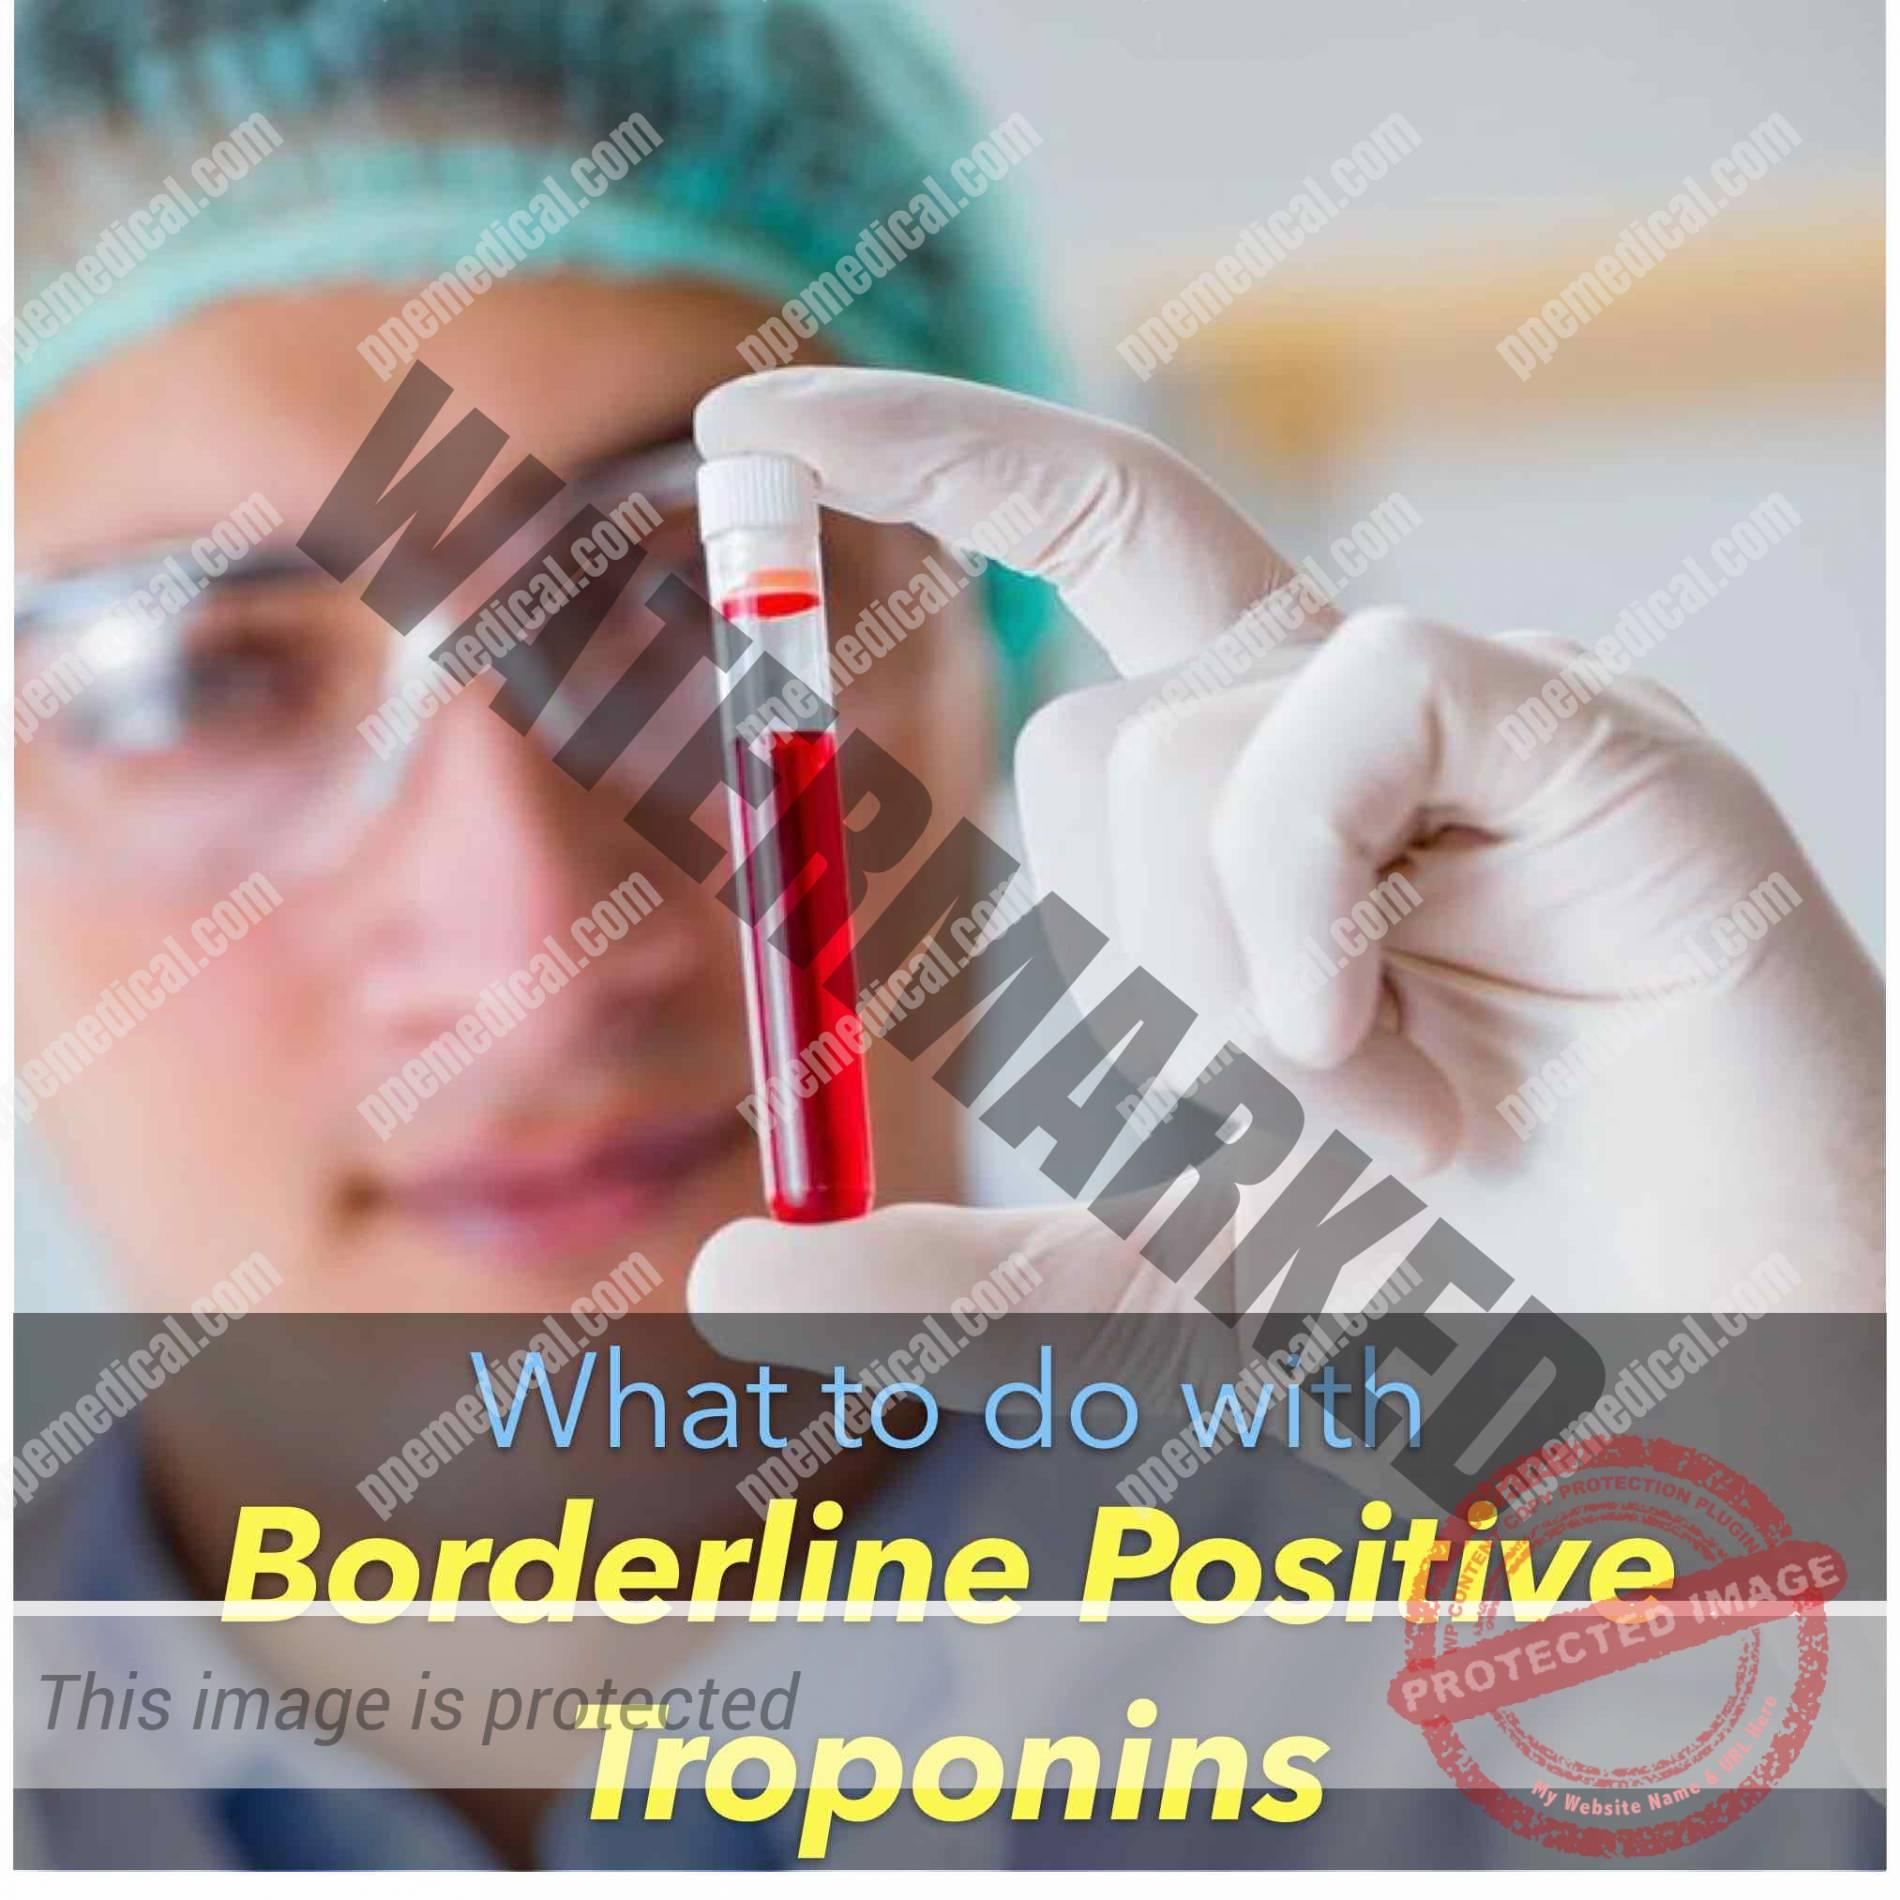 Borderline Positive Troponins